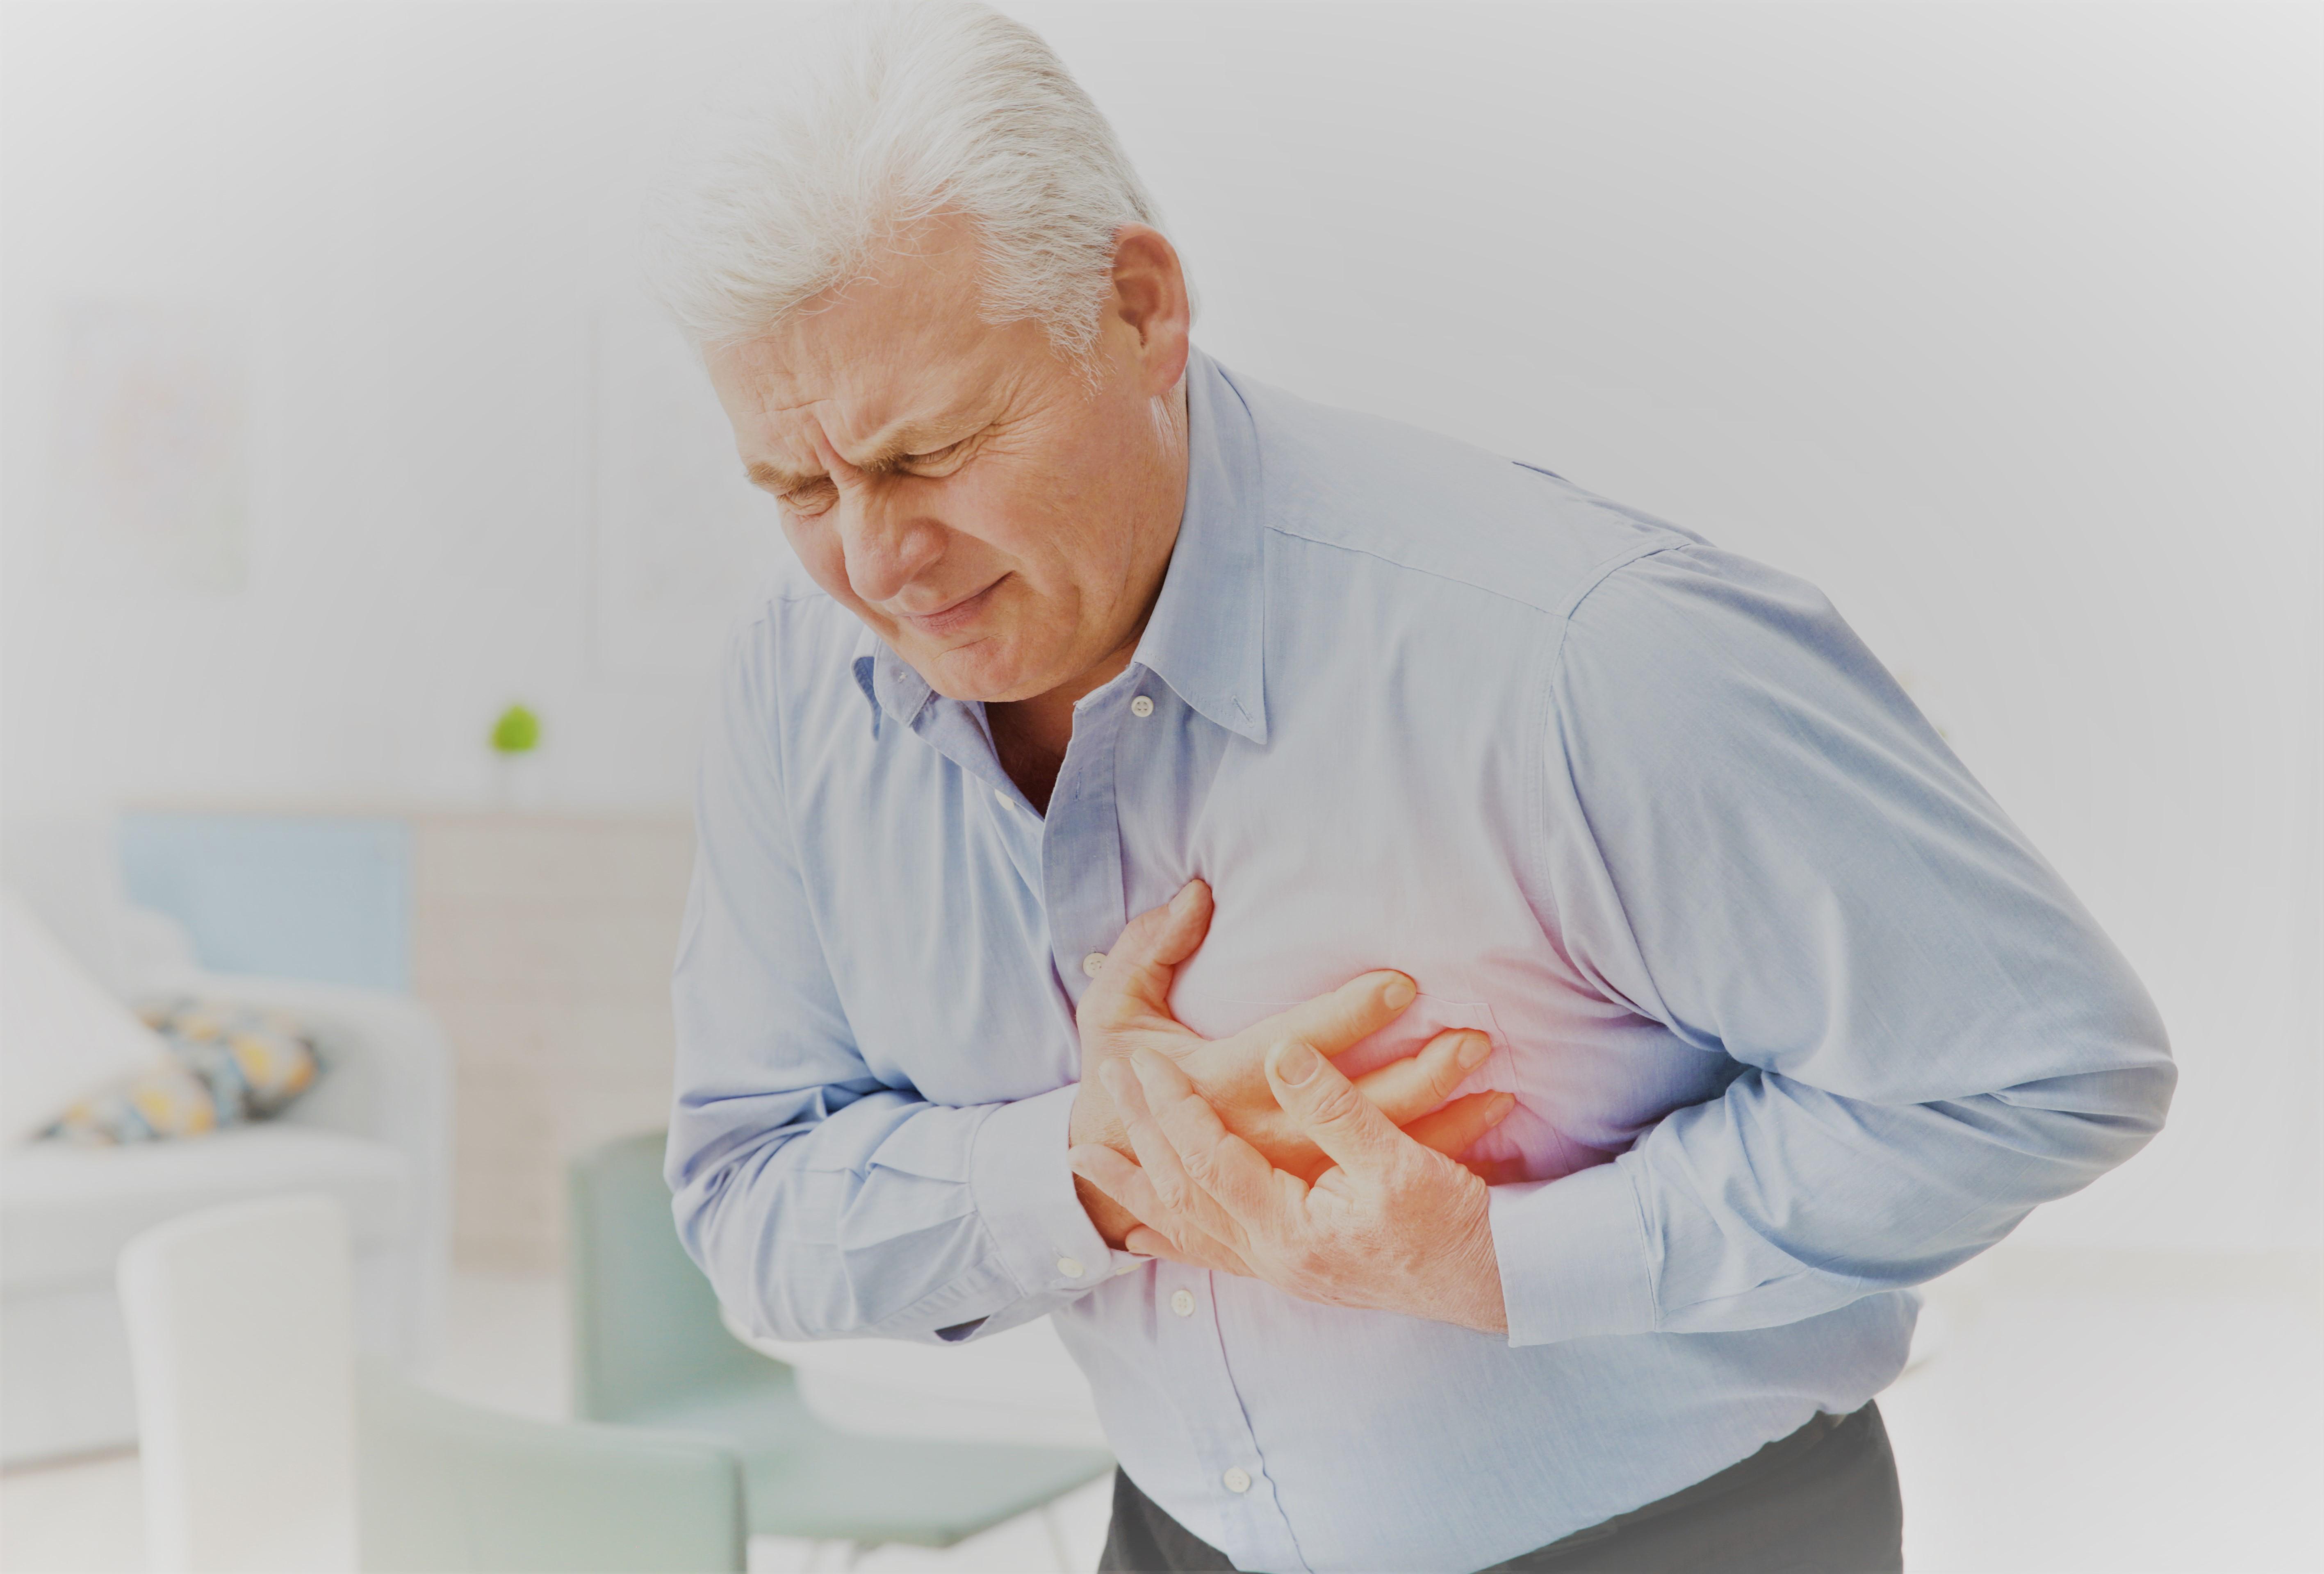 mellkasi fájdalom magas vérnyomás)